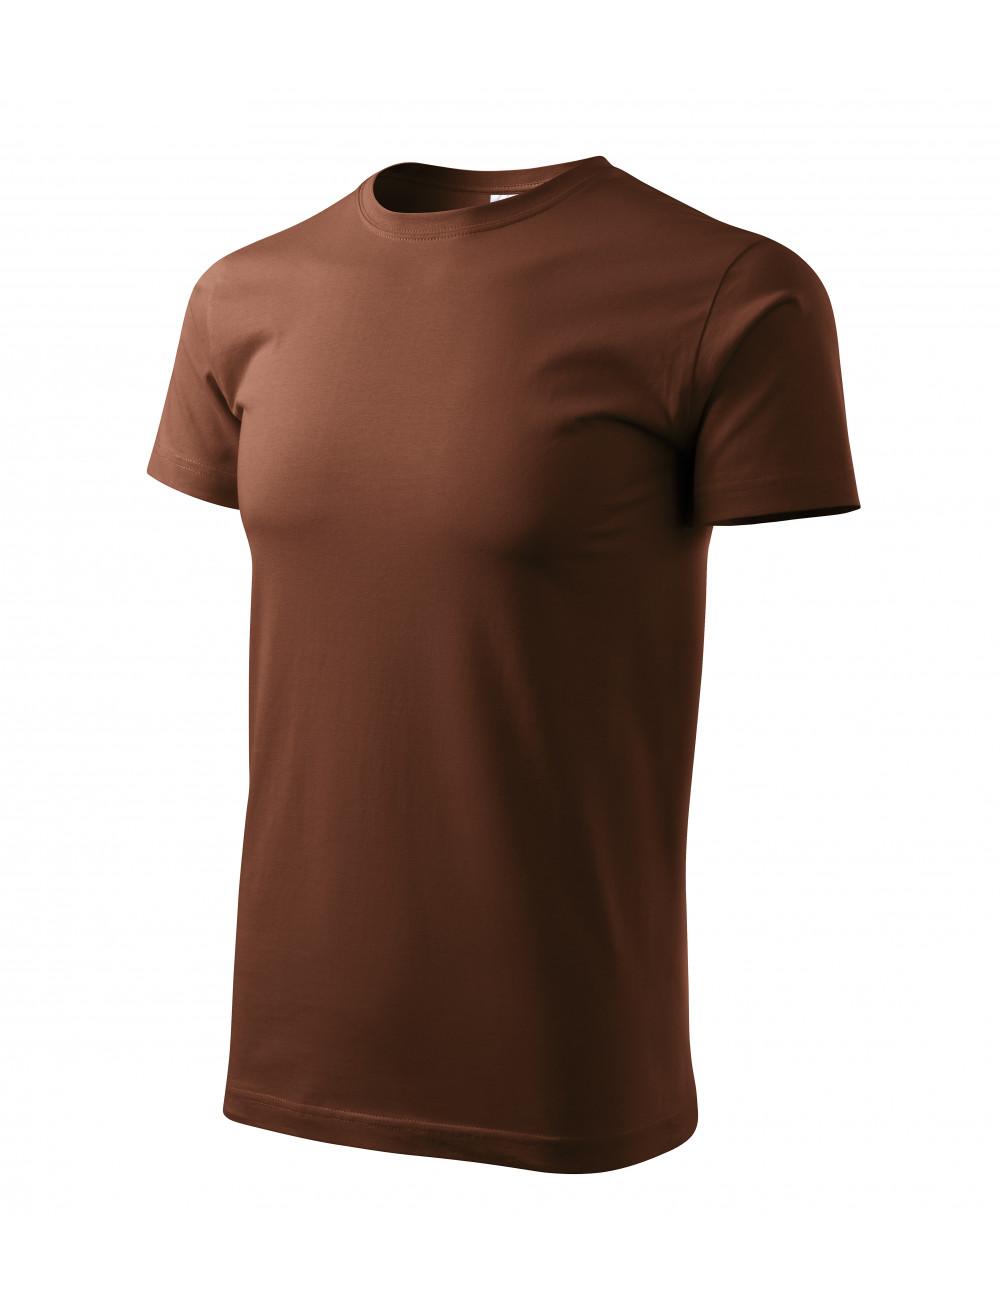 Adler MALFINI Koszulka unisex Heavy New 137 czekoladowy